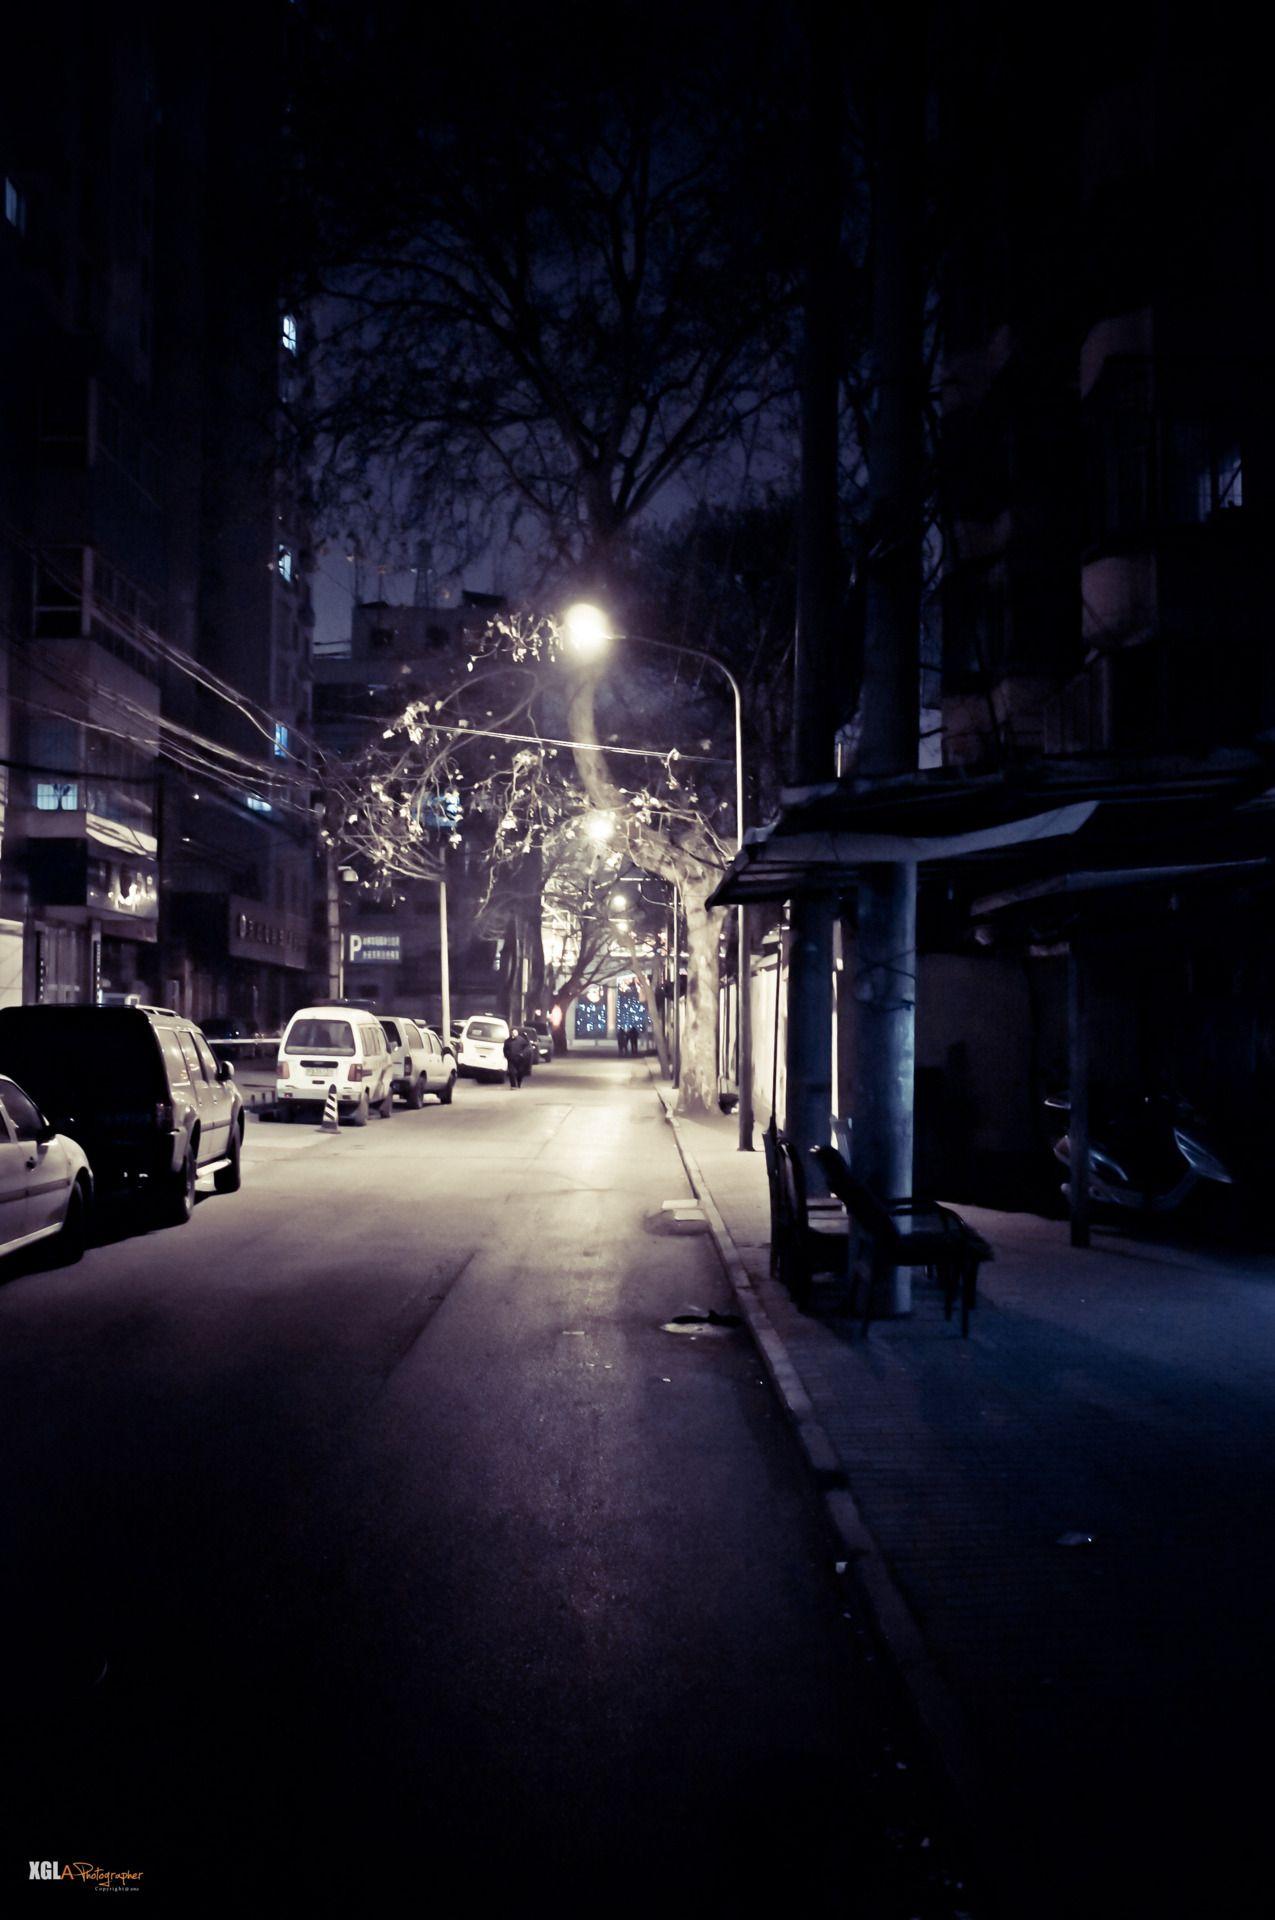 After Dark(Explore) by XGLA